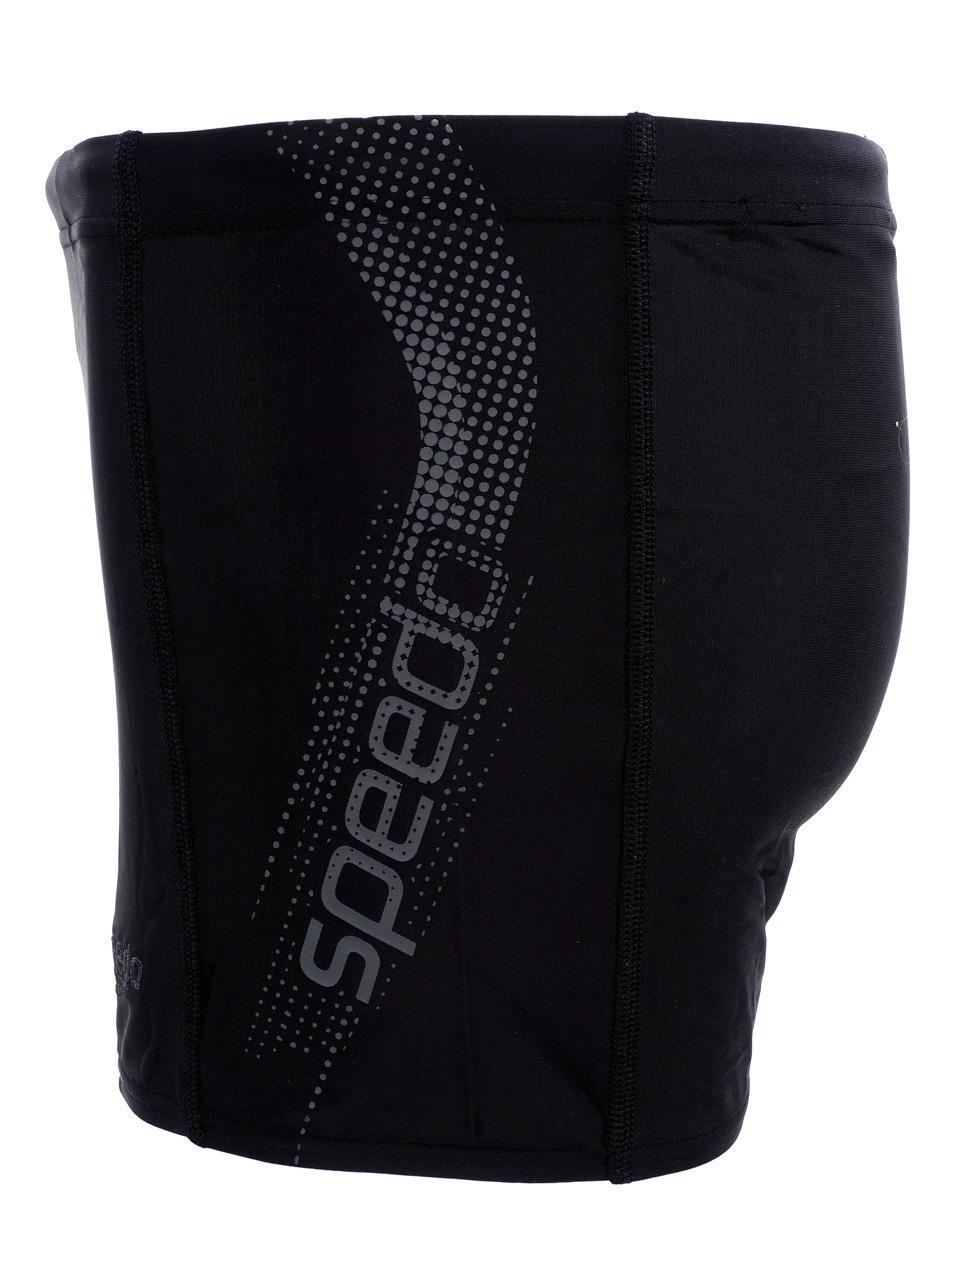 Boxer-Swimsuit-Speedo-Sports-Logo-Black-Gray-Black-58322-New thumbnail 2